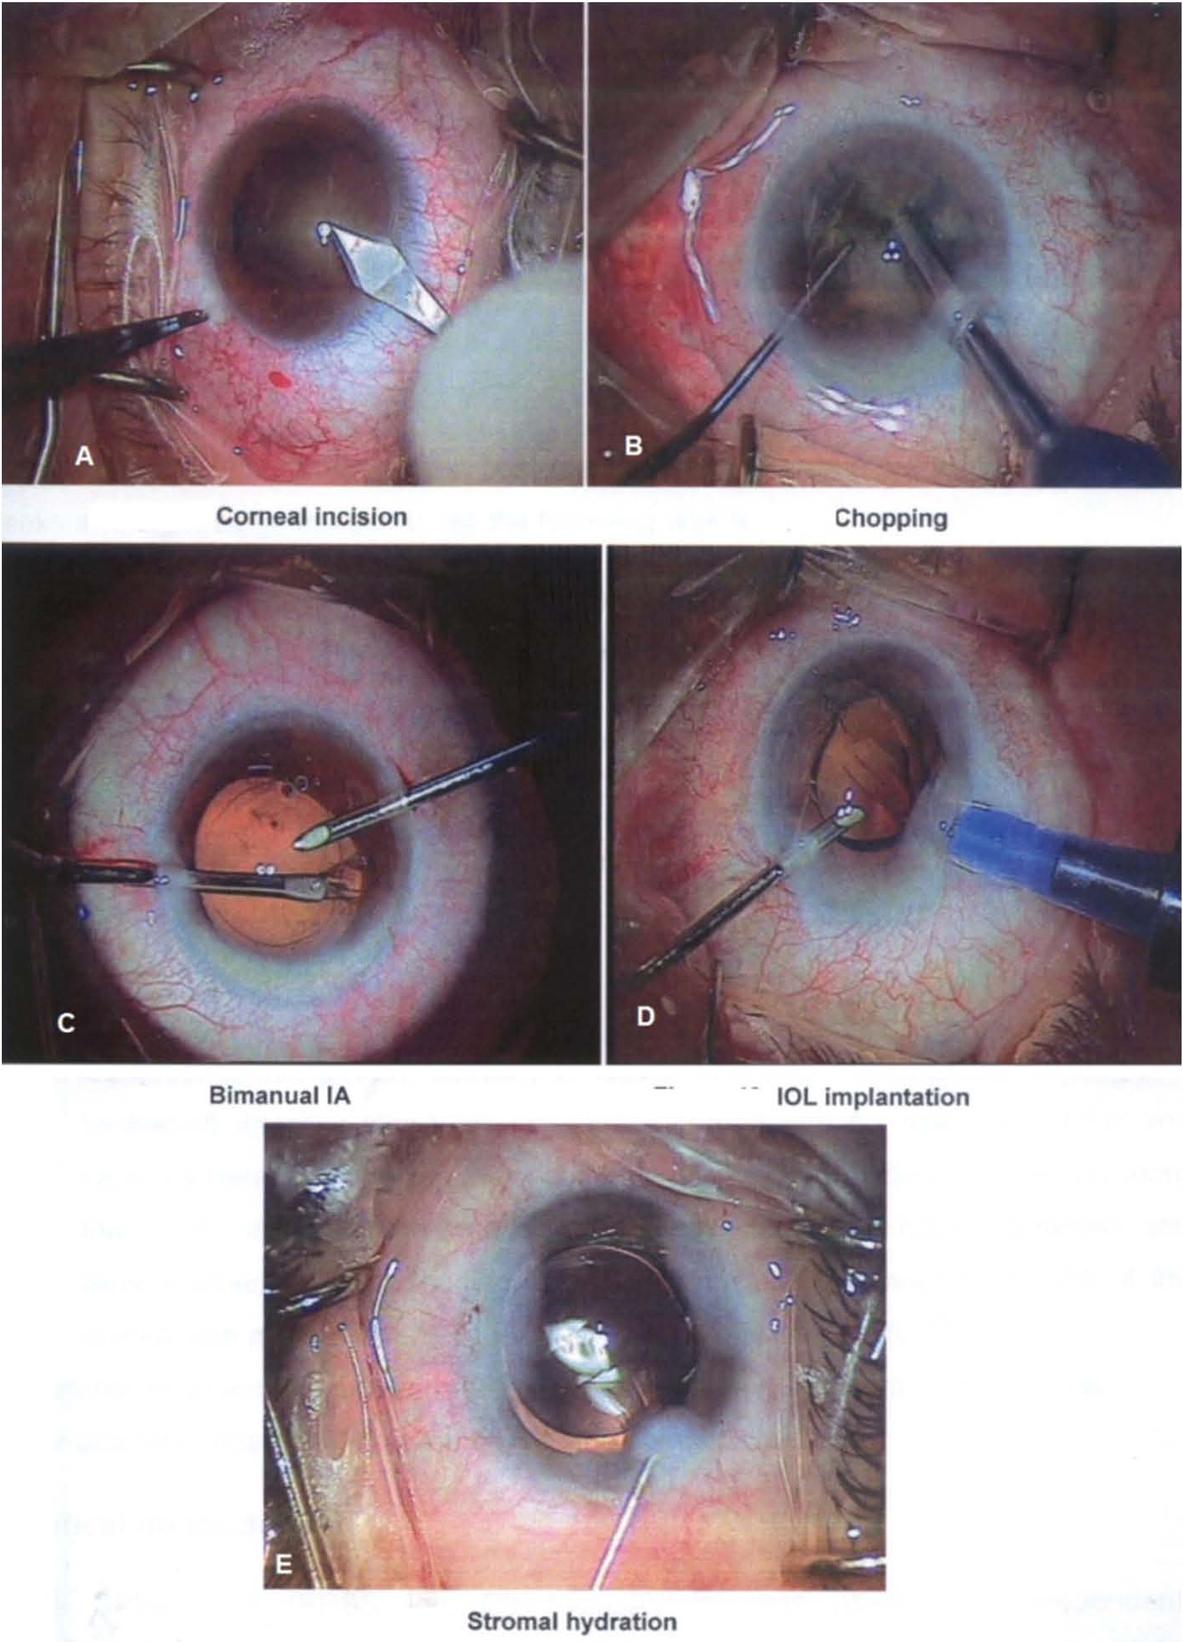 Phacoemulsification versus manual small incision cataract